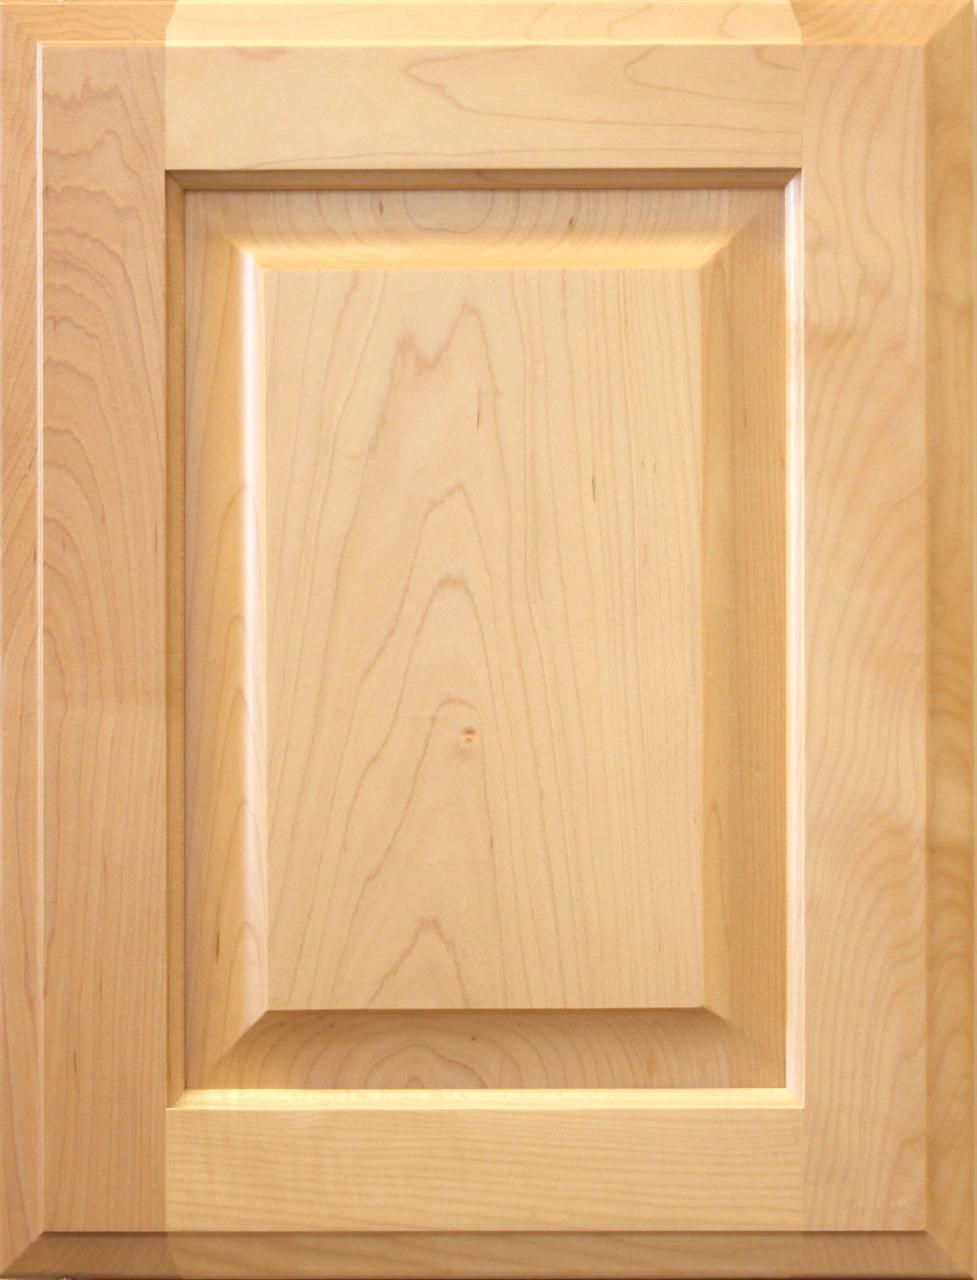 SEATTLE Raised Panel Cabinet Door